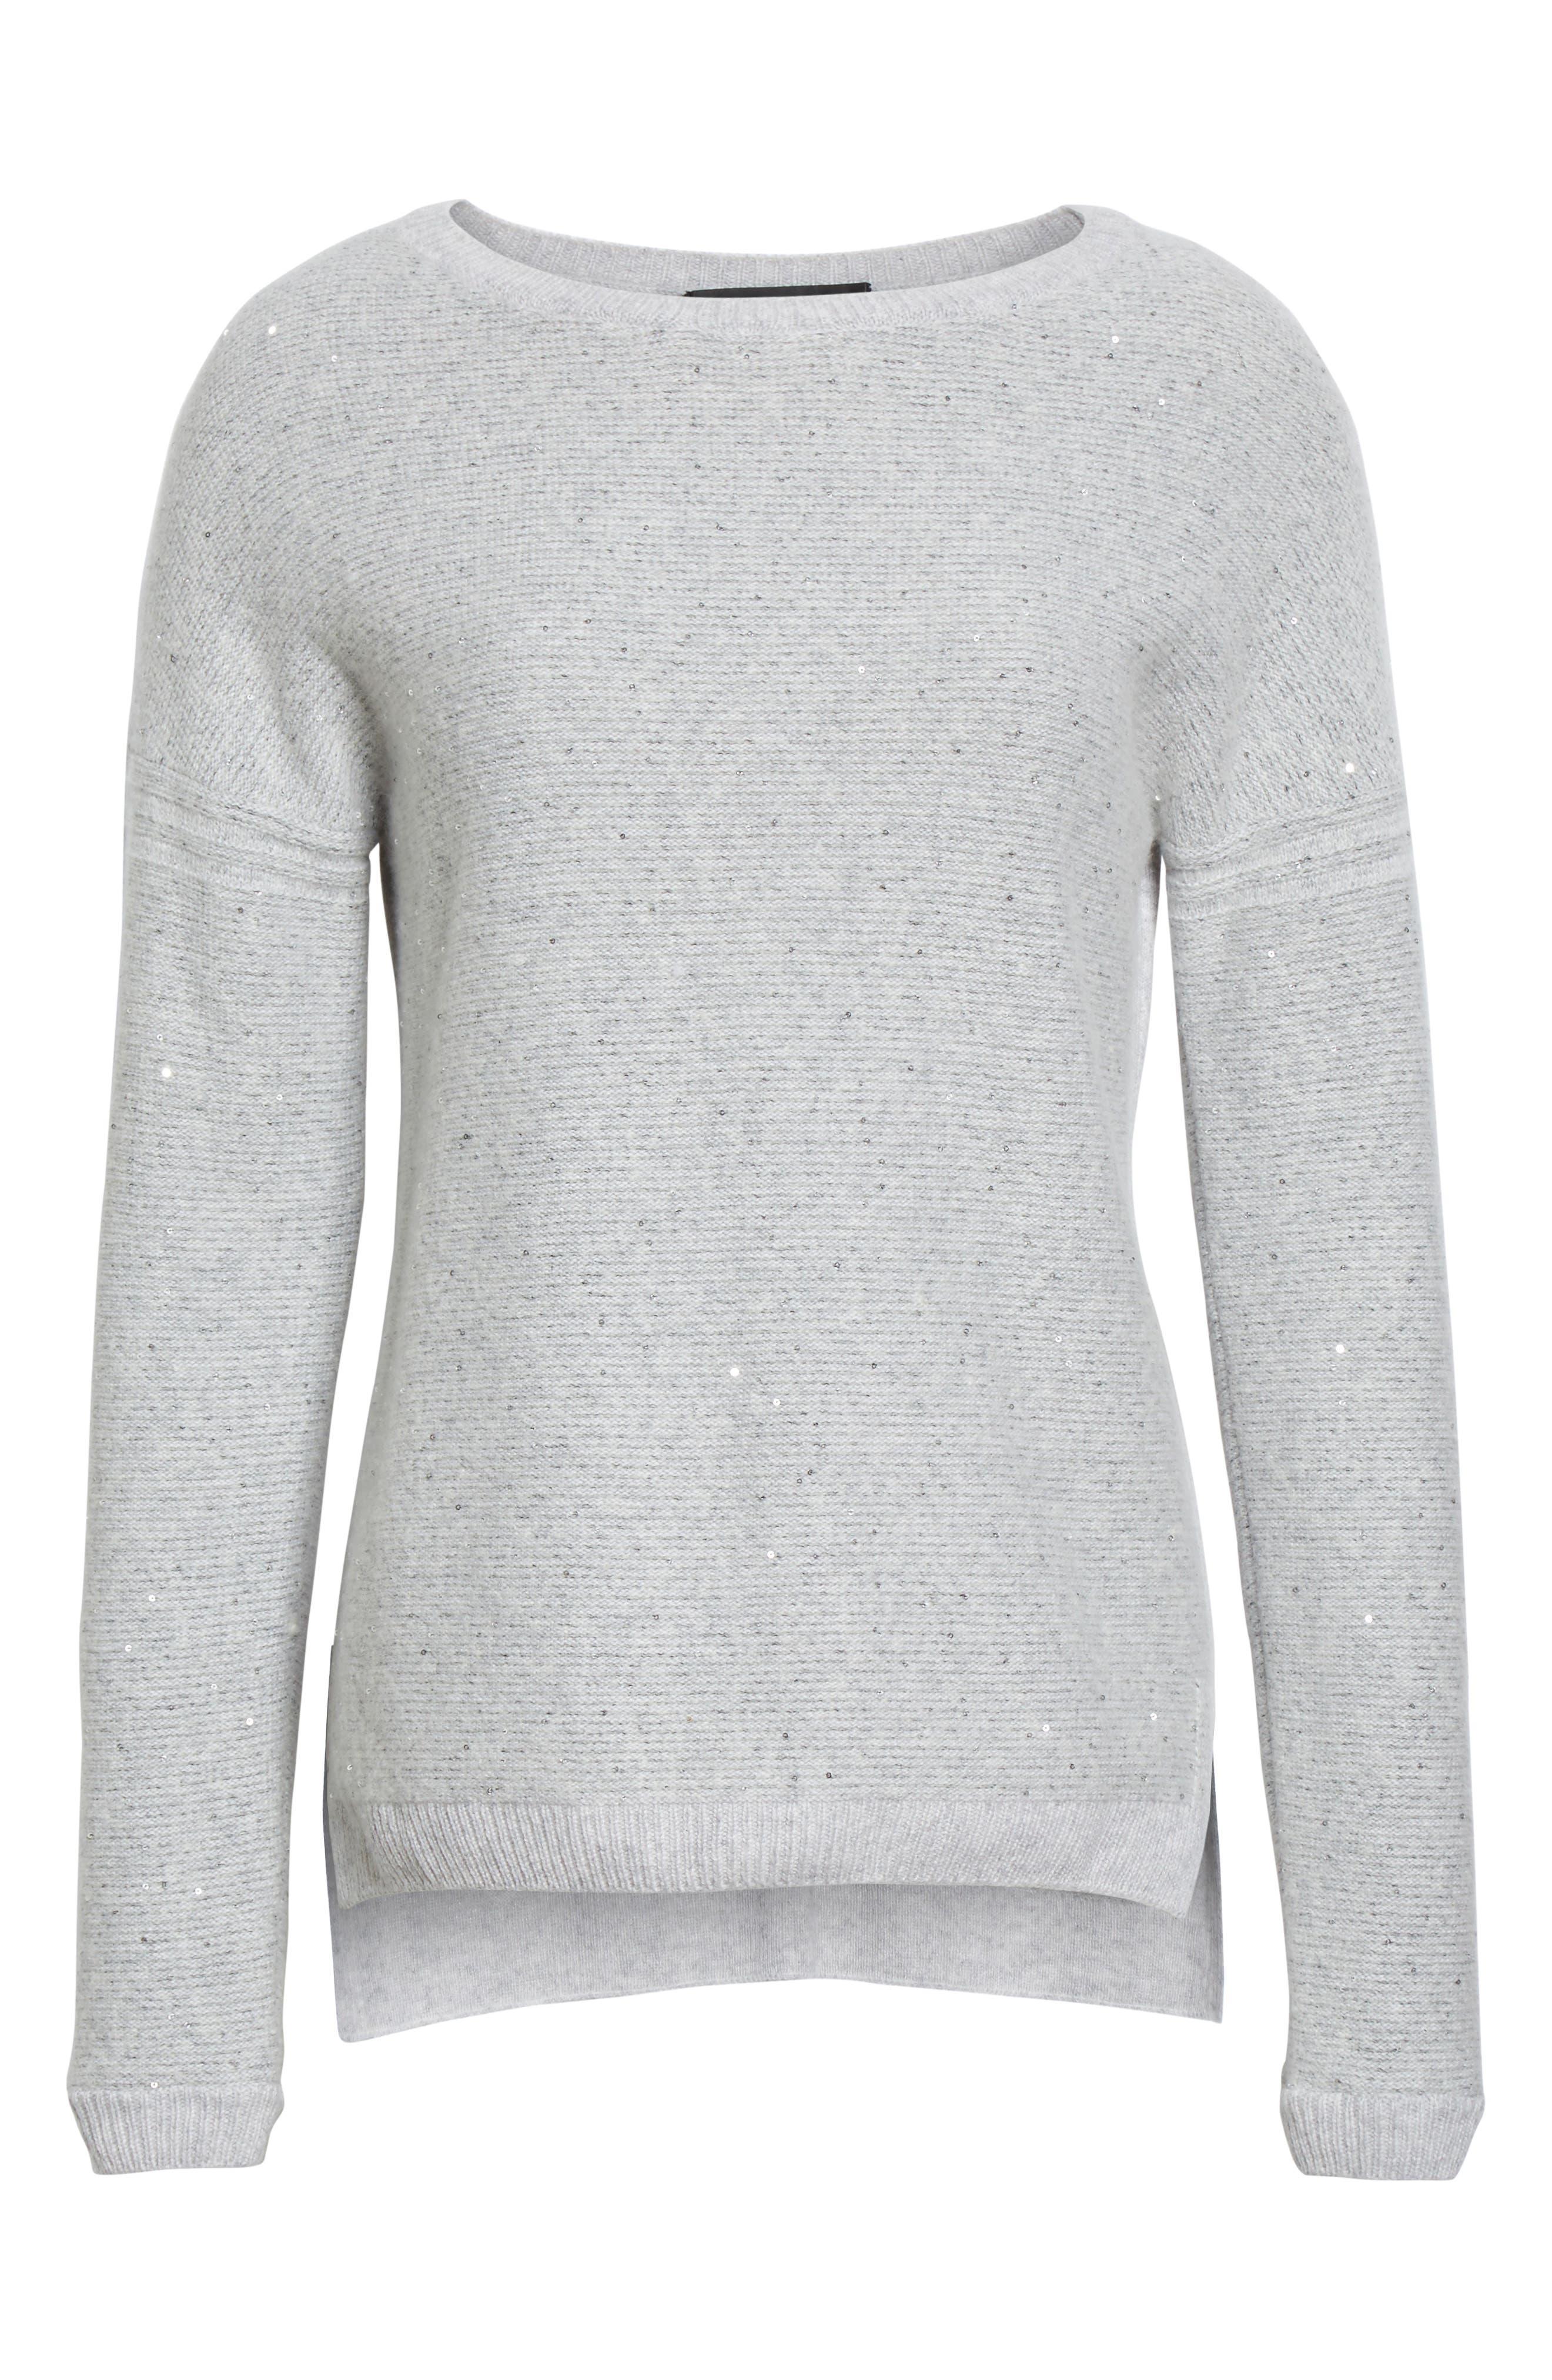 Micro Sequin Stripe Reverse Jersey Cashmere Blend Sweater,                             Alternate thumbnail 6, color,                             Light Grey Melange